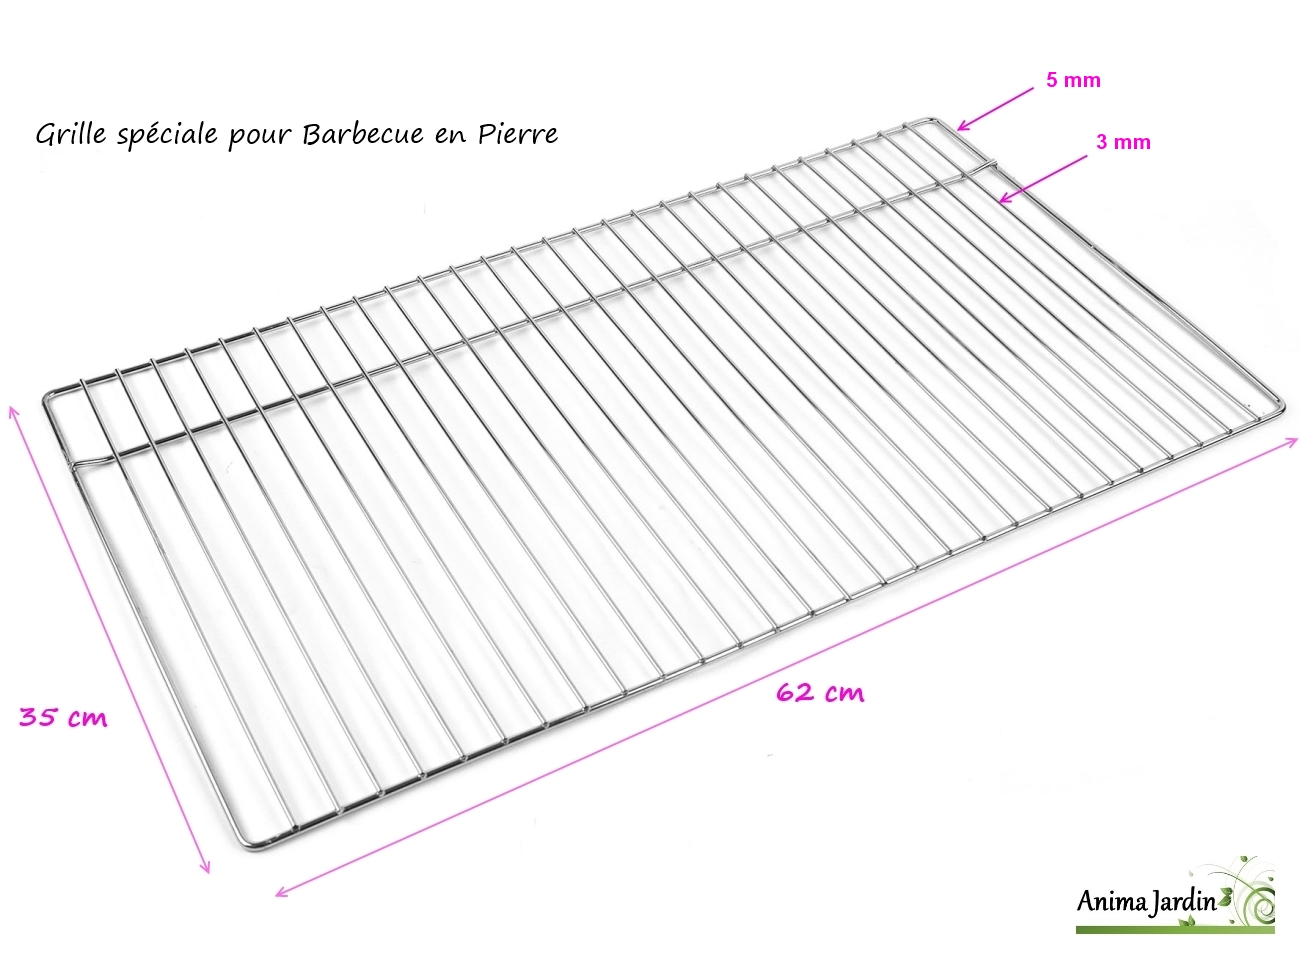 grille barbecue 62 x 35 cm grille simple de cuisson en. Black Bedroom Furniture Sets. Home Design Ideas